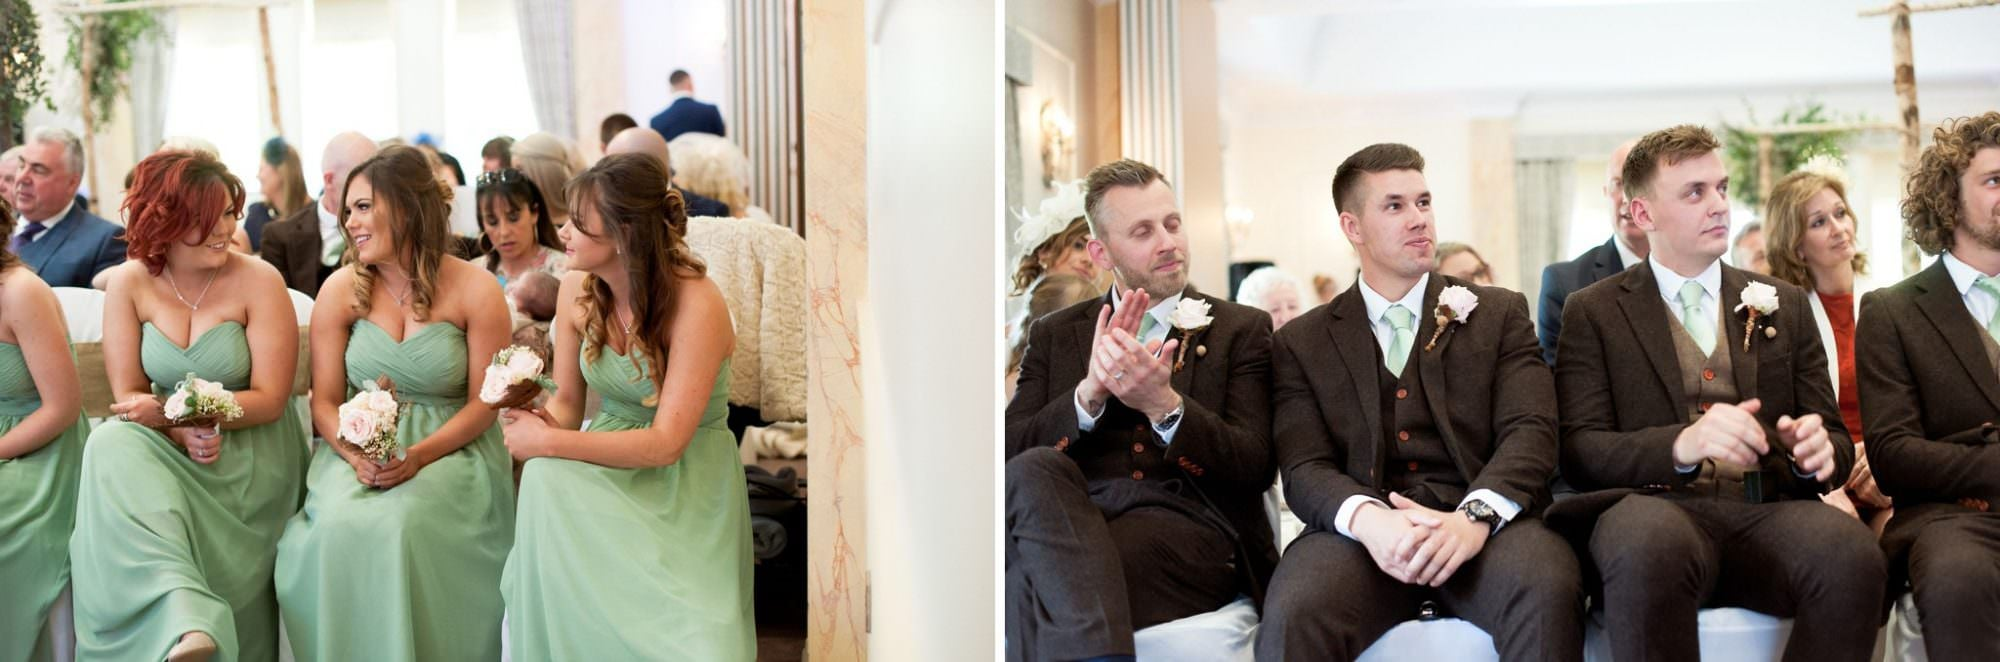 Photography of Bridesmaids and Ushers in Brockenhurst Wedding